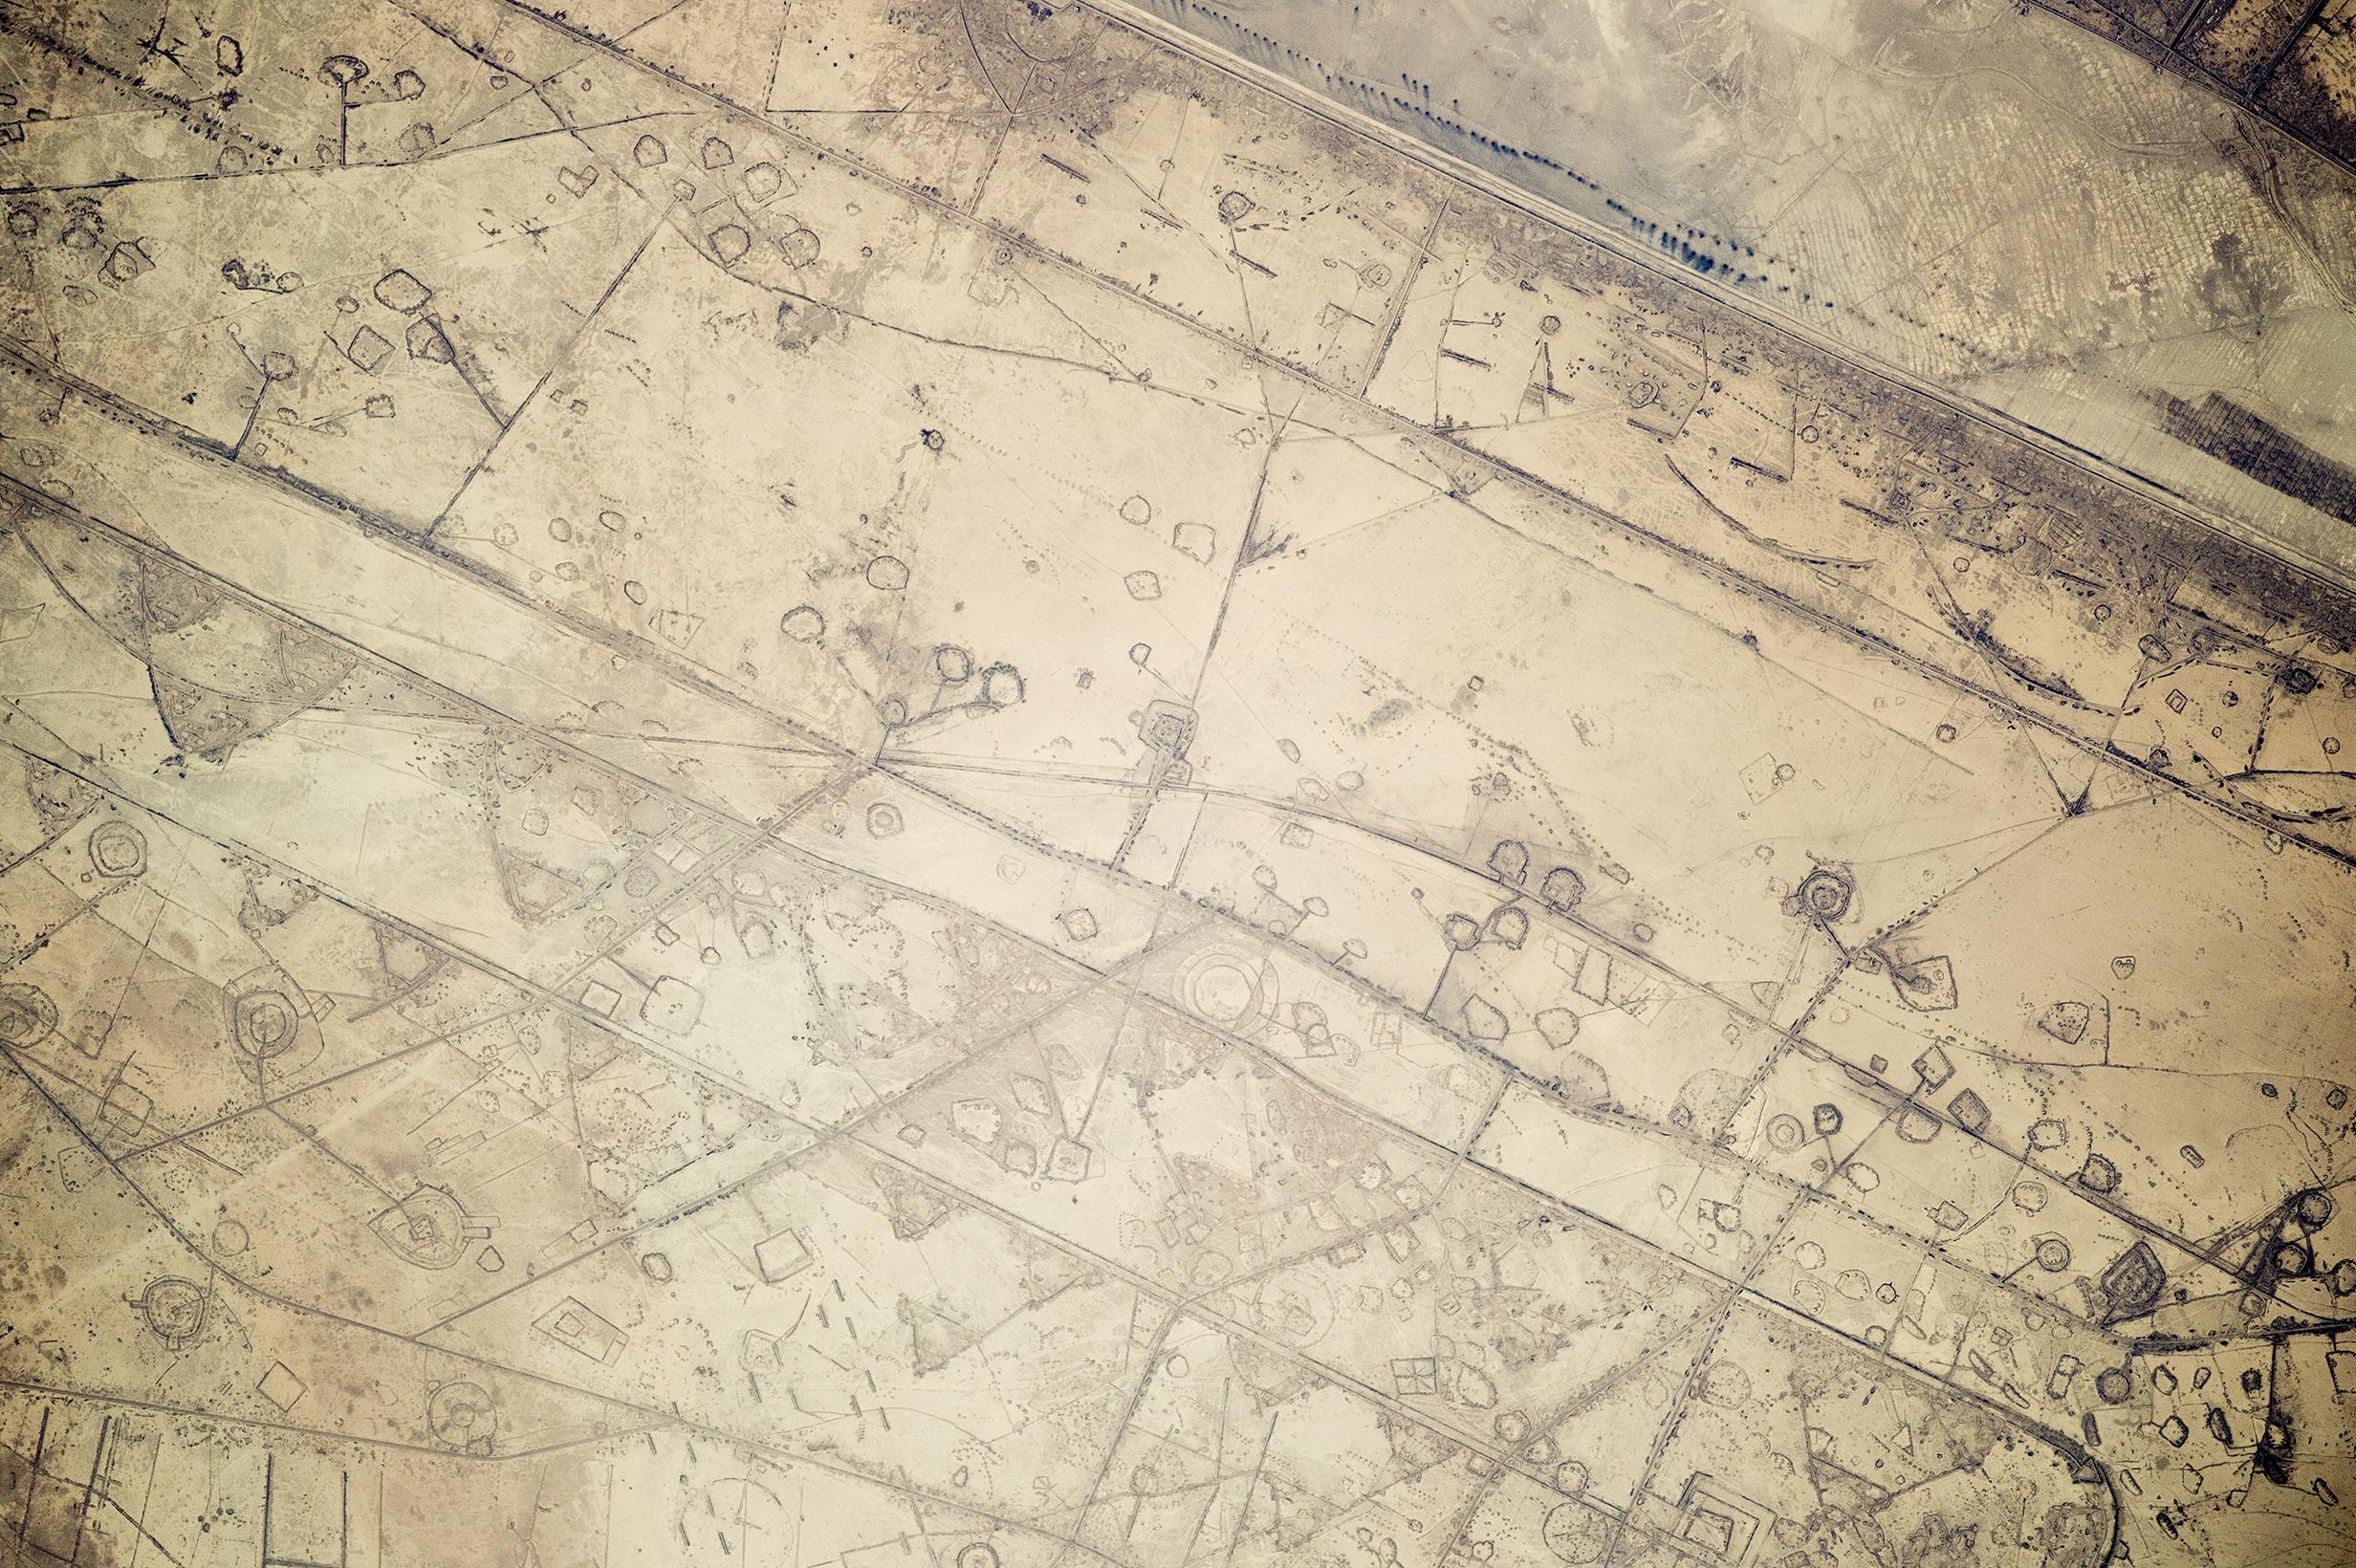 Fortification Patterns on the Iraq-Iran Border